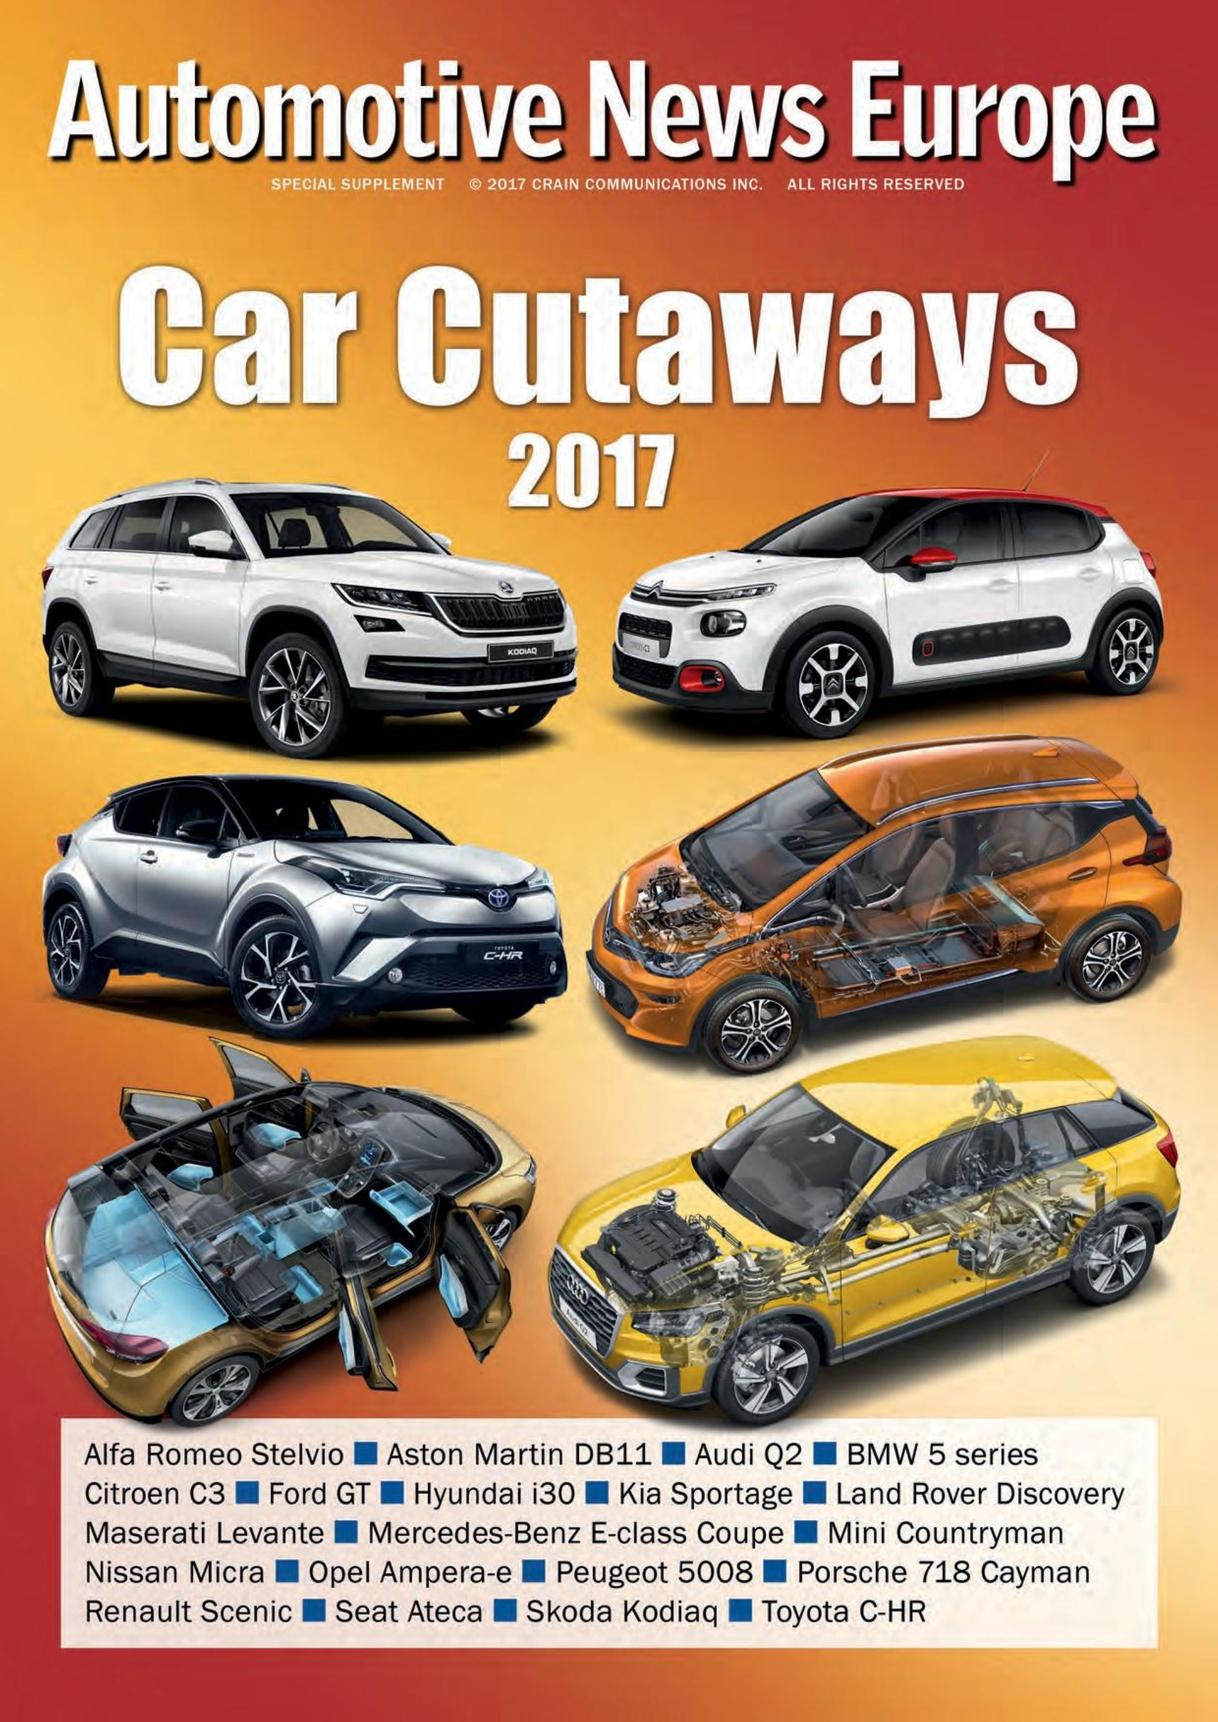 Automotive News Europe Car Cutaways Supplement Bolsa 3dsxl Cars Speed Circuit Gamees